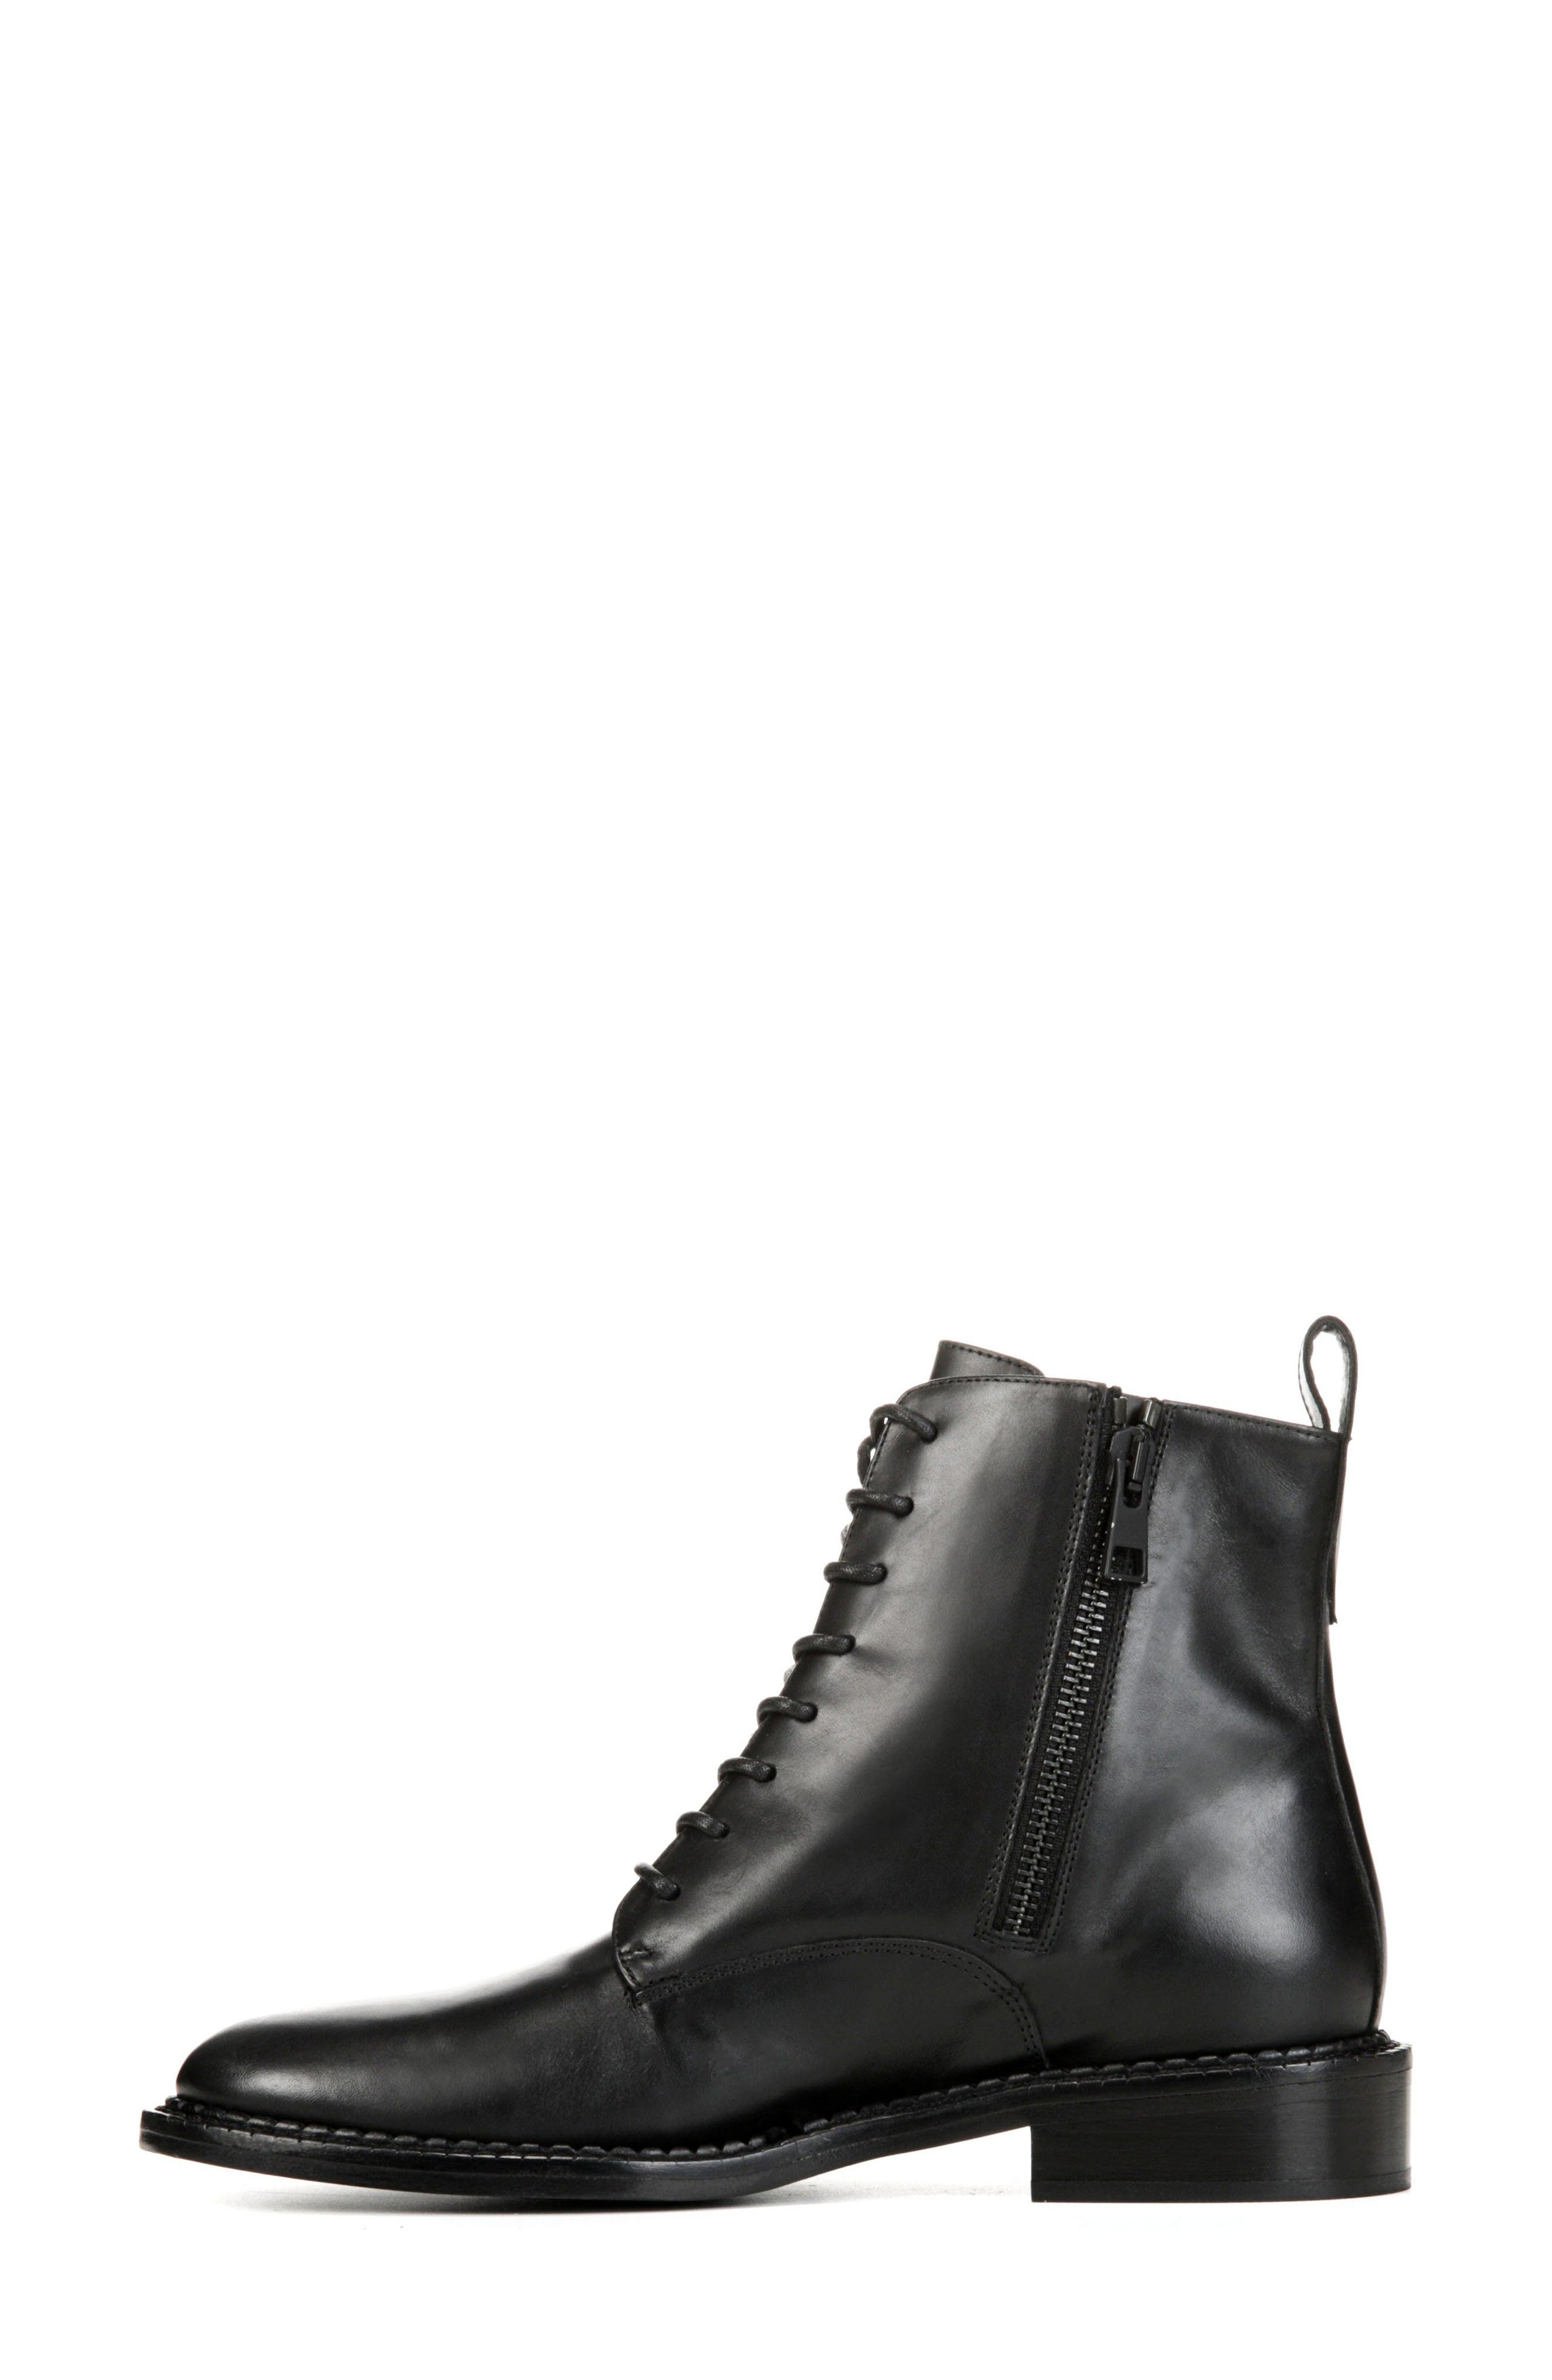 VINCE, Cabria Lace-Up Boot, Alternate thumbnail 3, color, BLACK